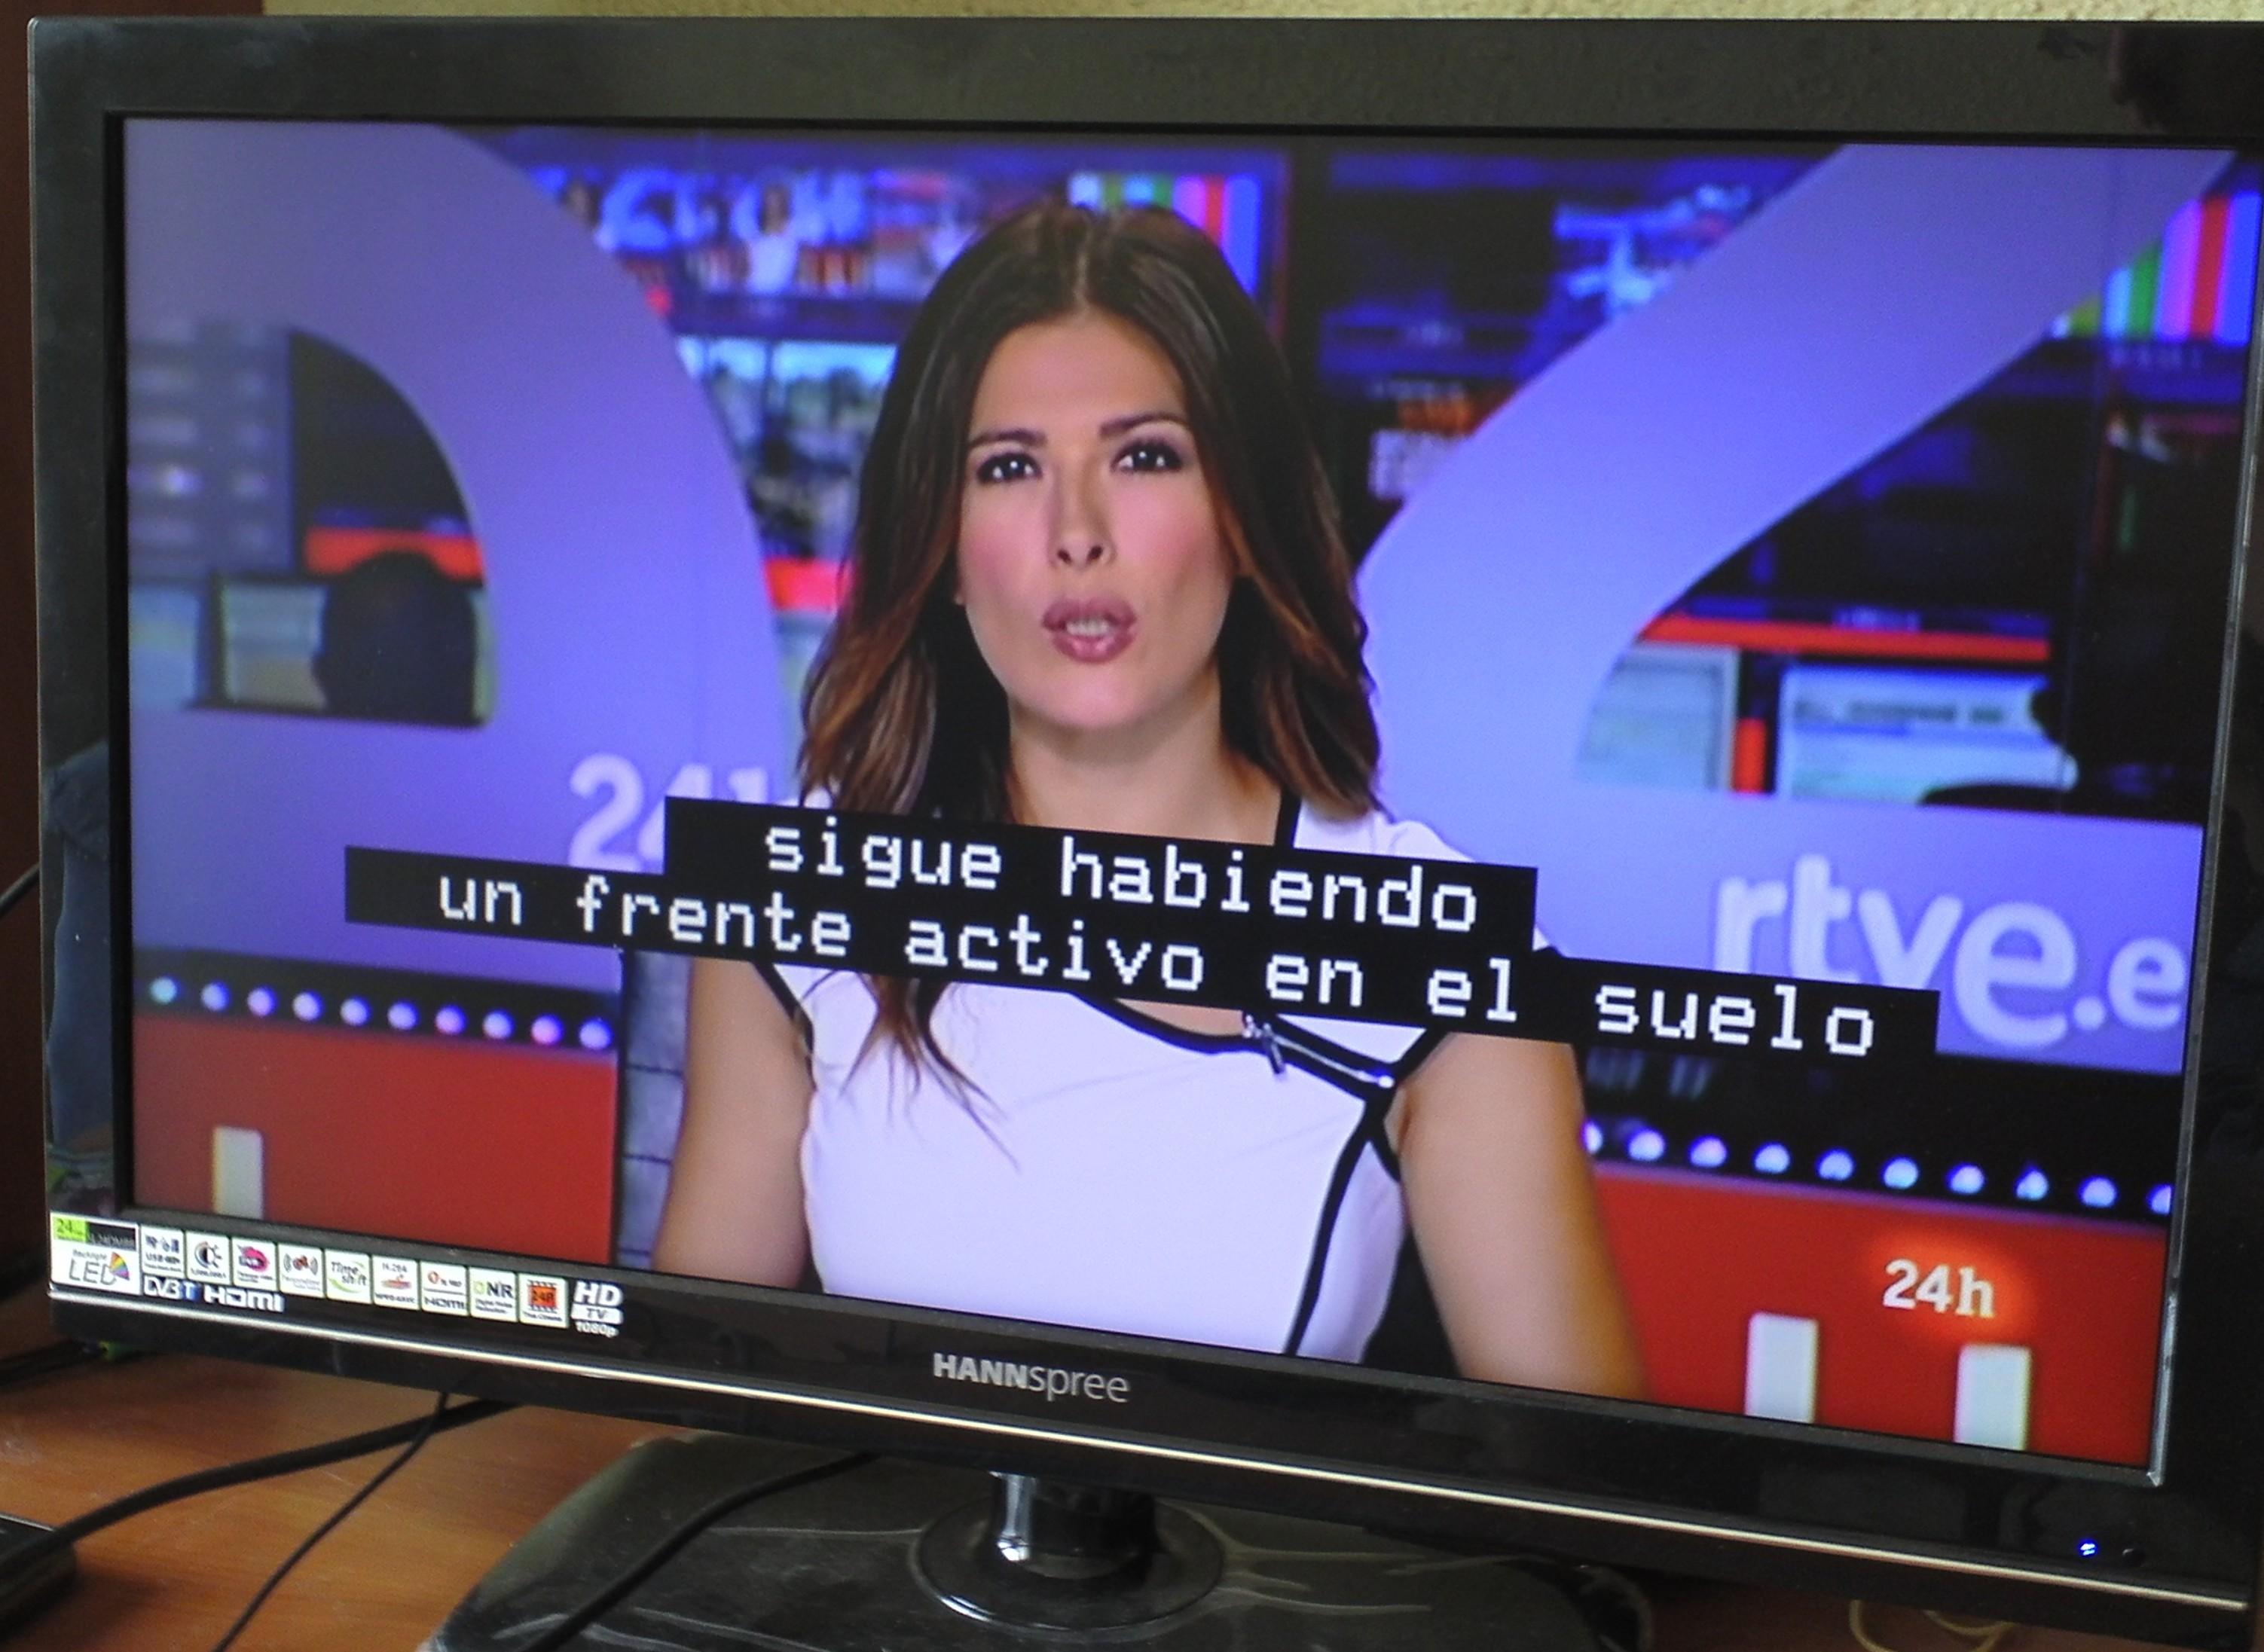 zetrader nouvelle tv espagnole tnt espagnole tdt hd tv 1080p vga hdmi usb sous titres espagnols